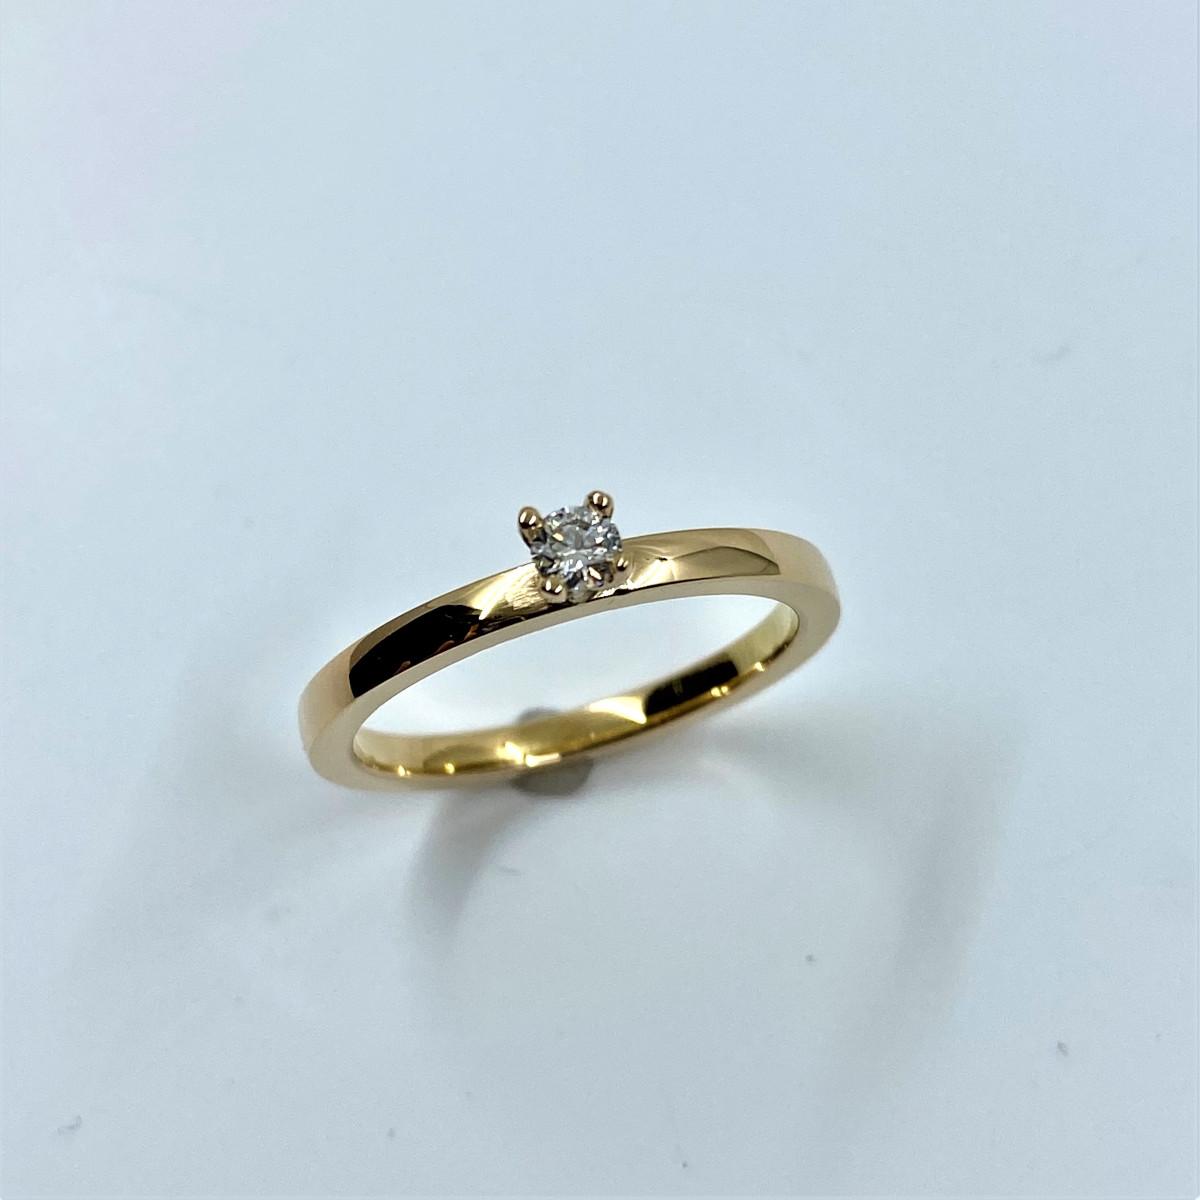 Förlovningsringar, vigselringar, rödguldsringar, diamantringar